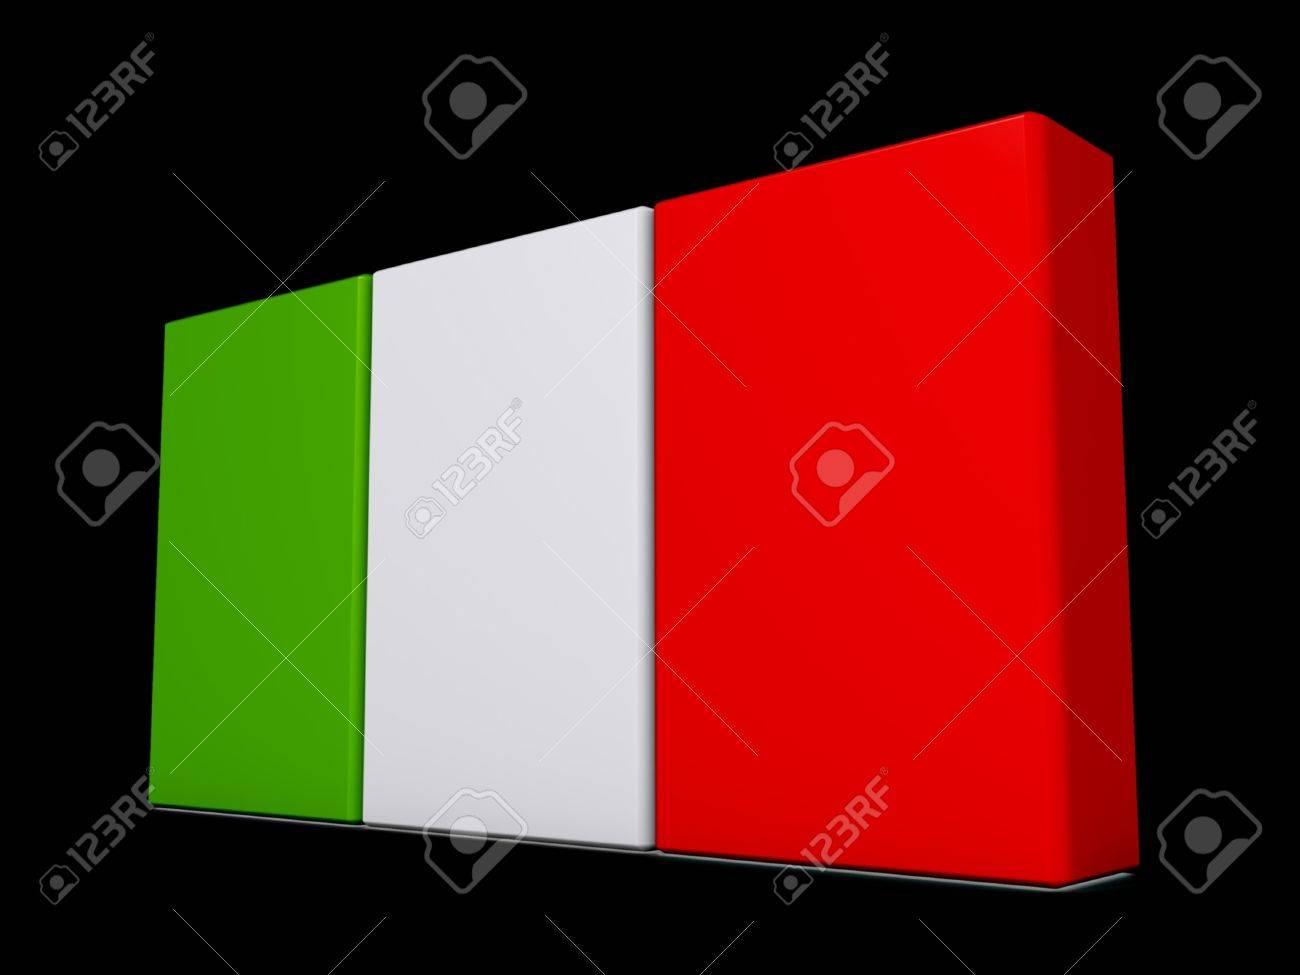 Italy Flag on a shiny black background. Stock Photo - 18356831